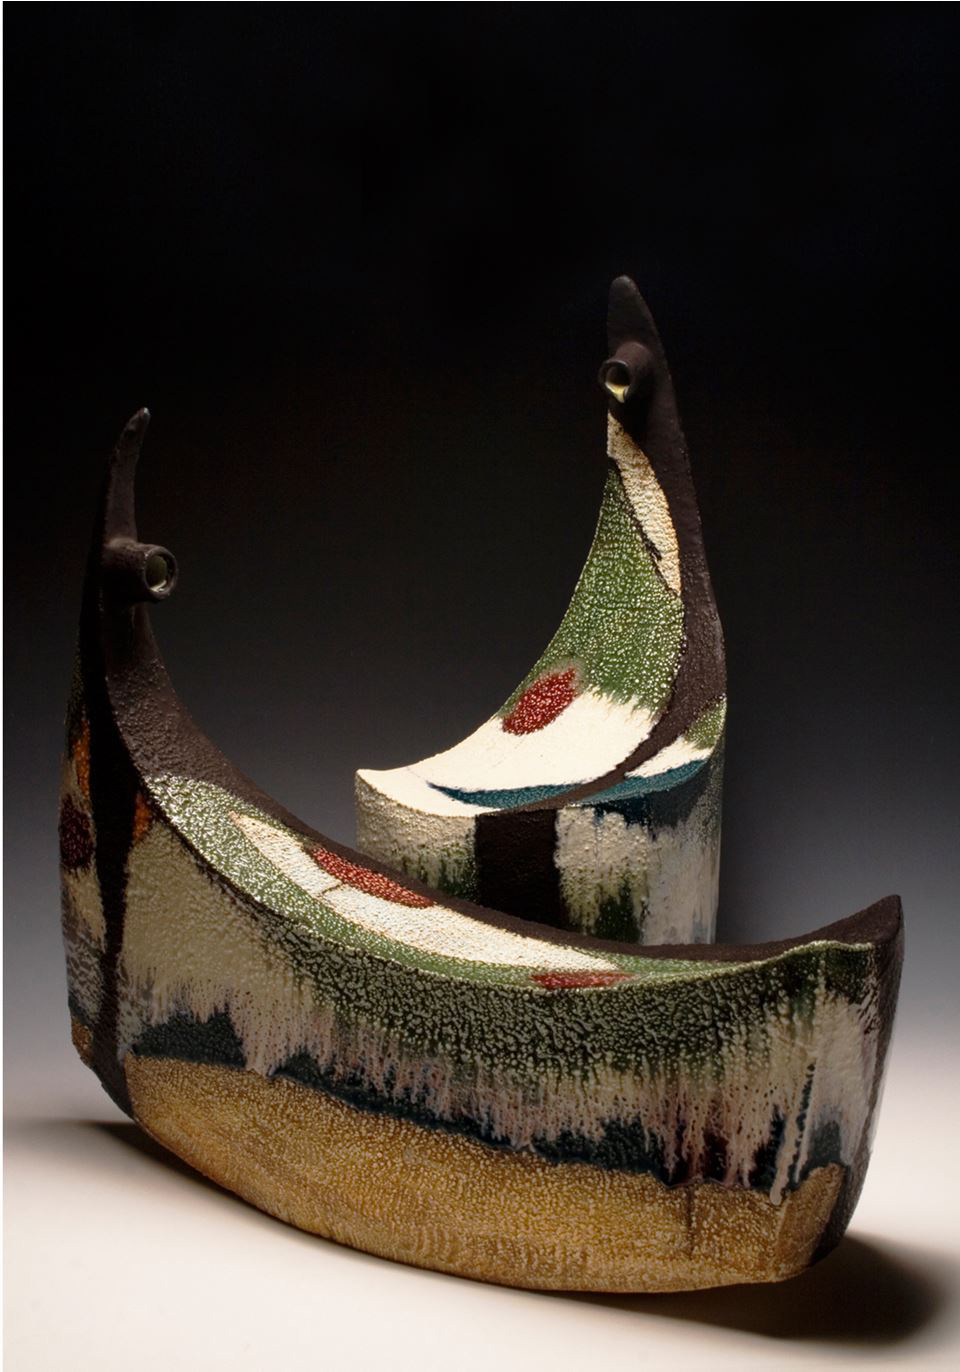 Sculpture by Michelle Mendlowitz